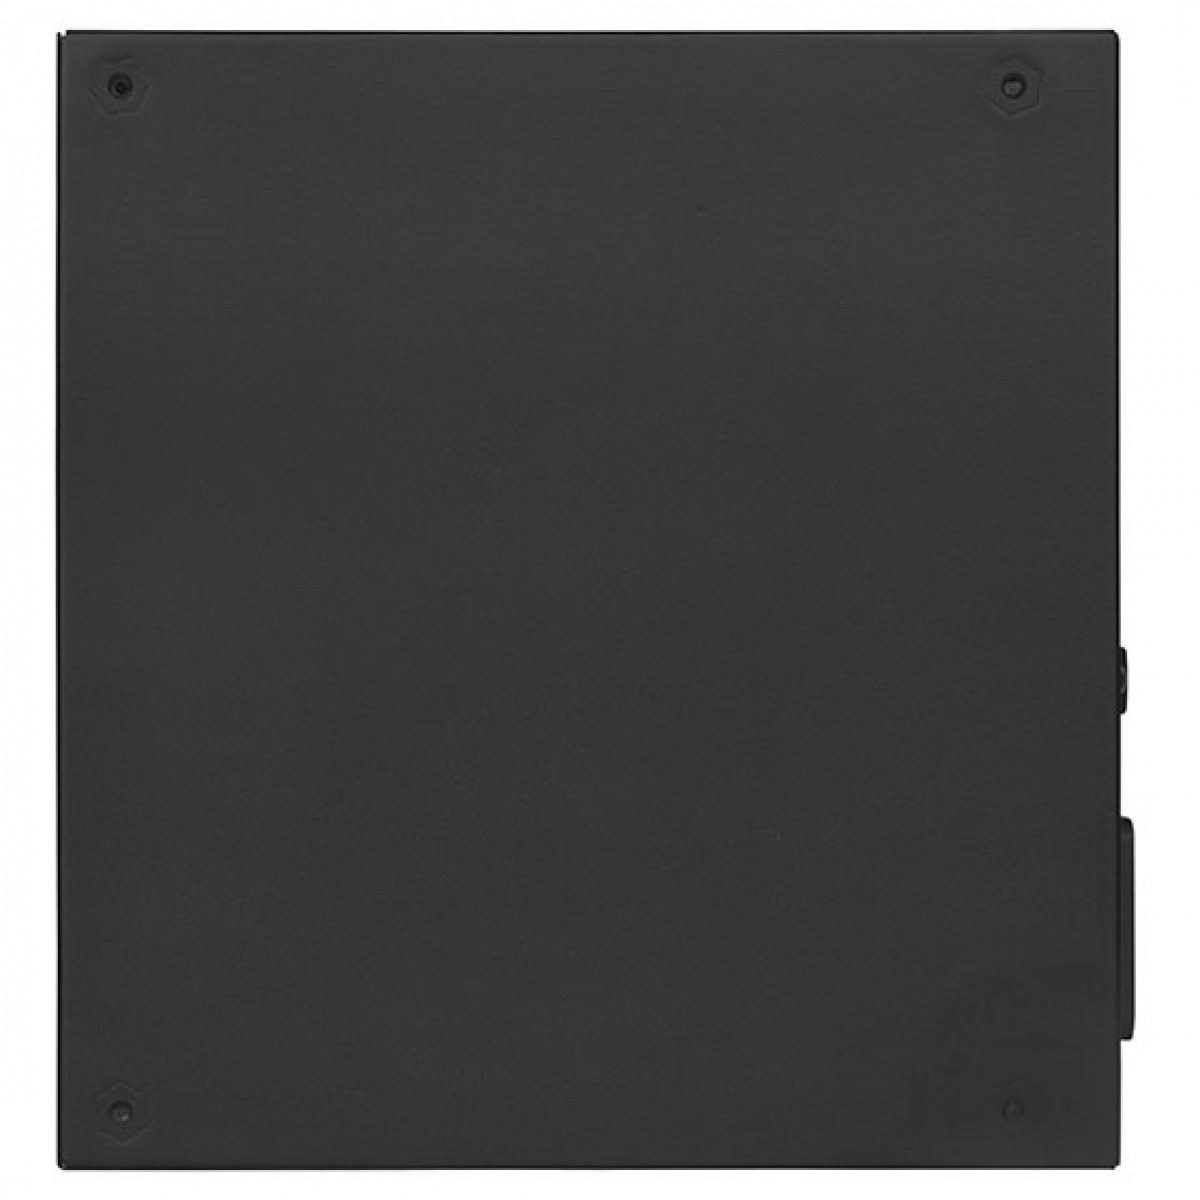 Fonte SilverStone SST-ET750-G, 750W, 80 Plus Gold, PFC Ativo, SST-ET750-G